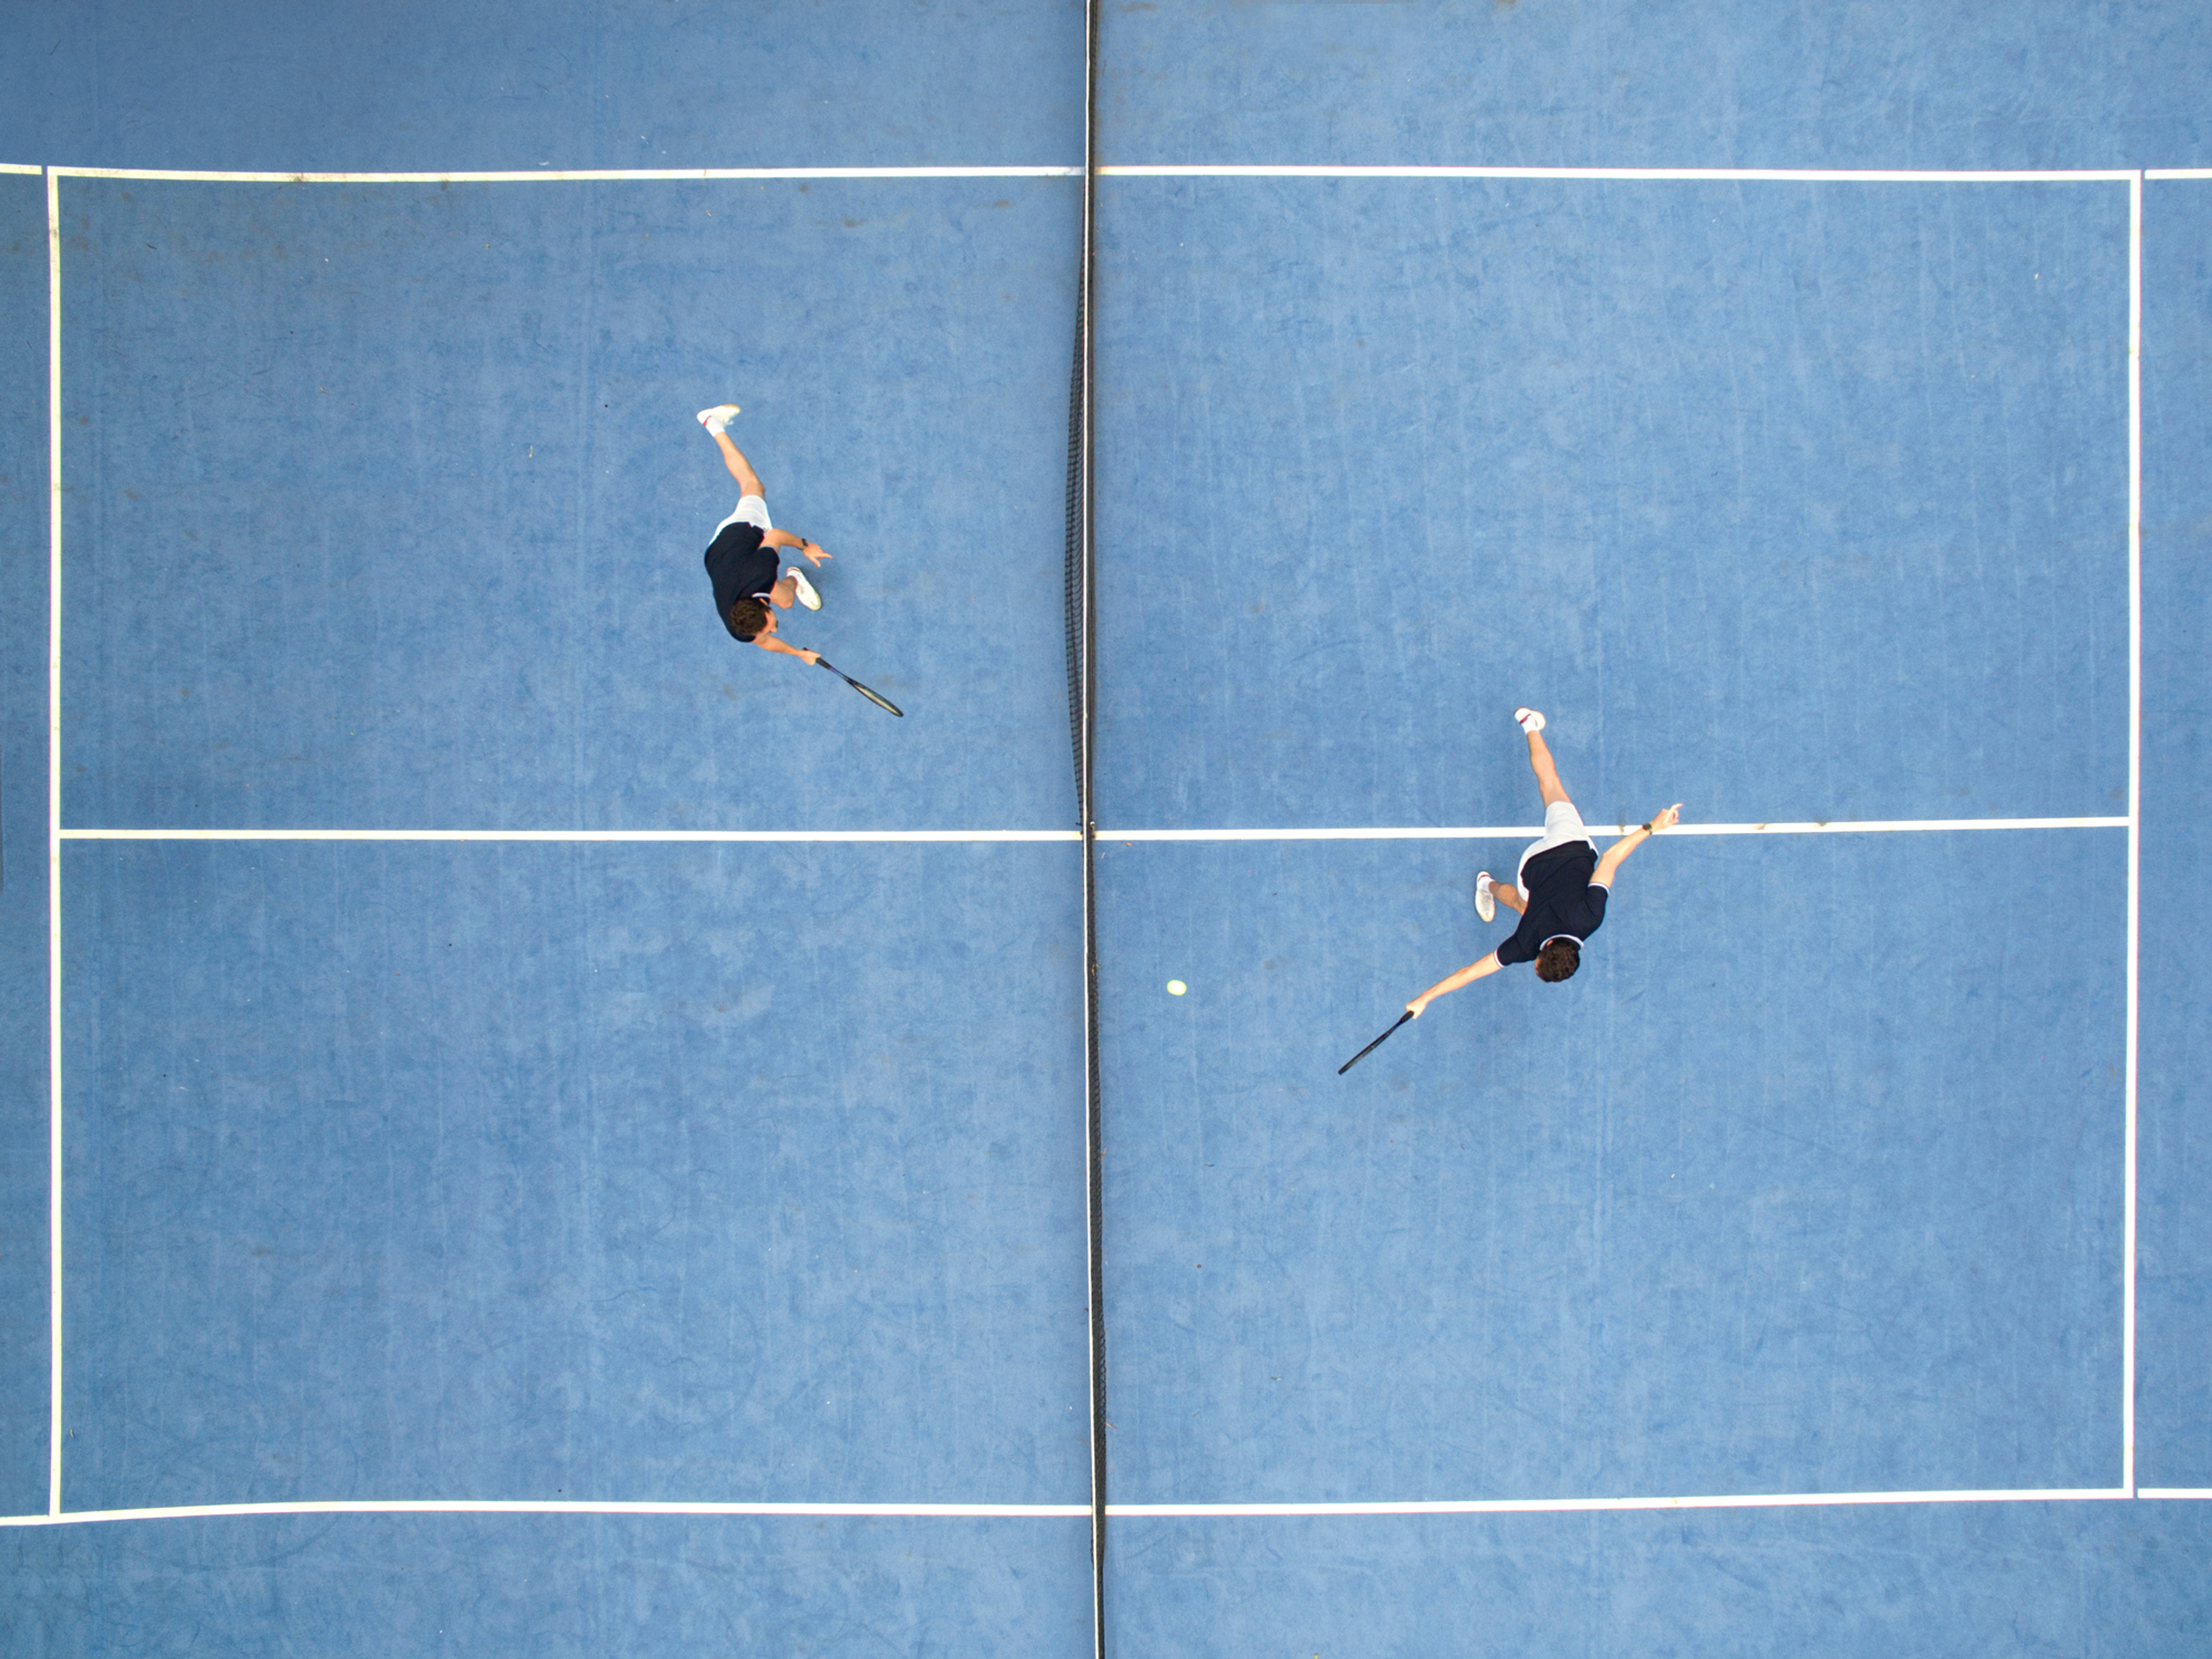 U16 Tennis Lessons - Session 1